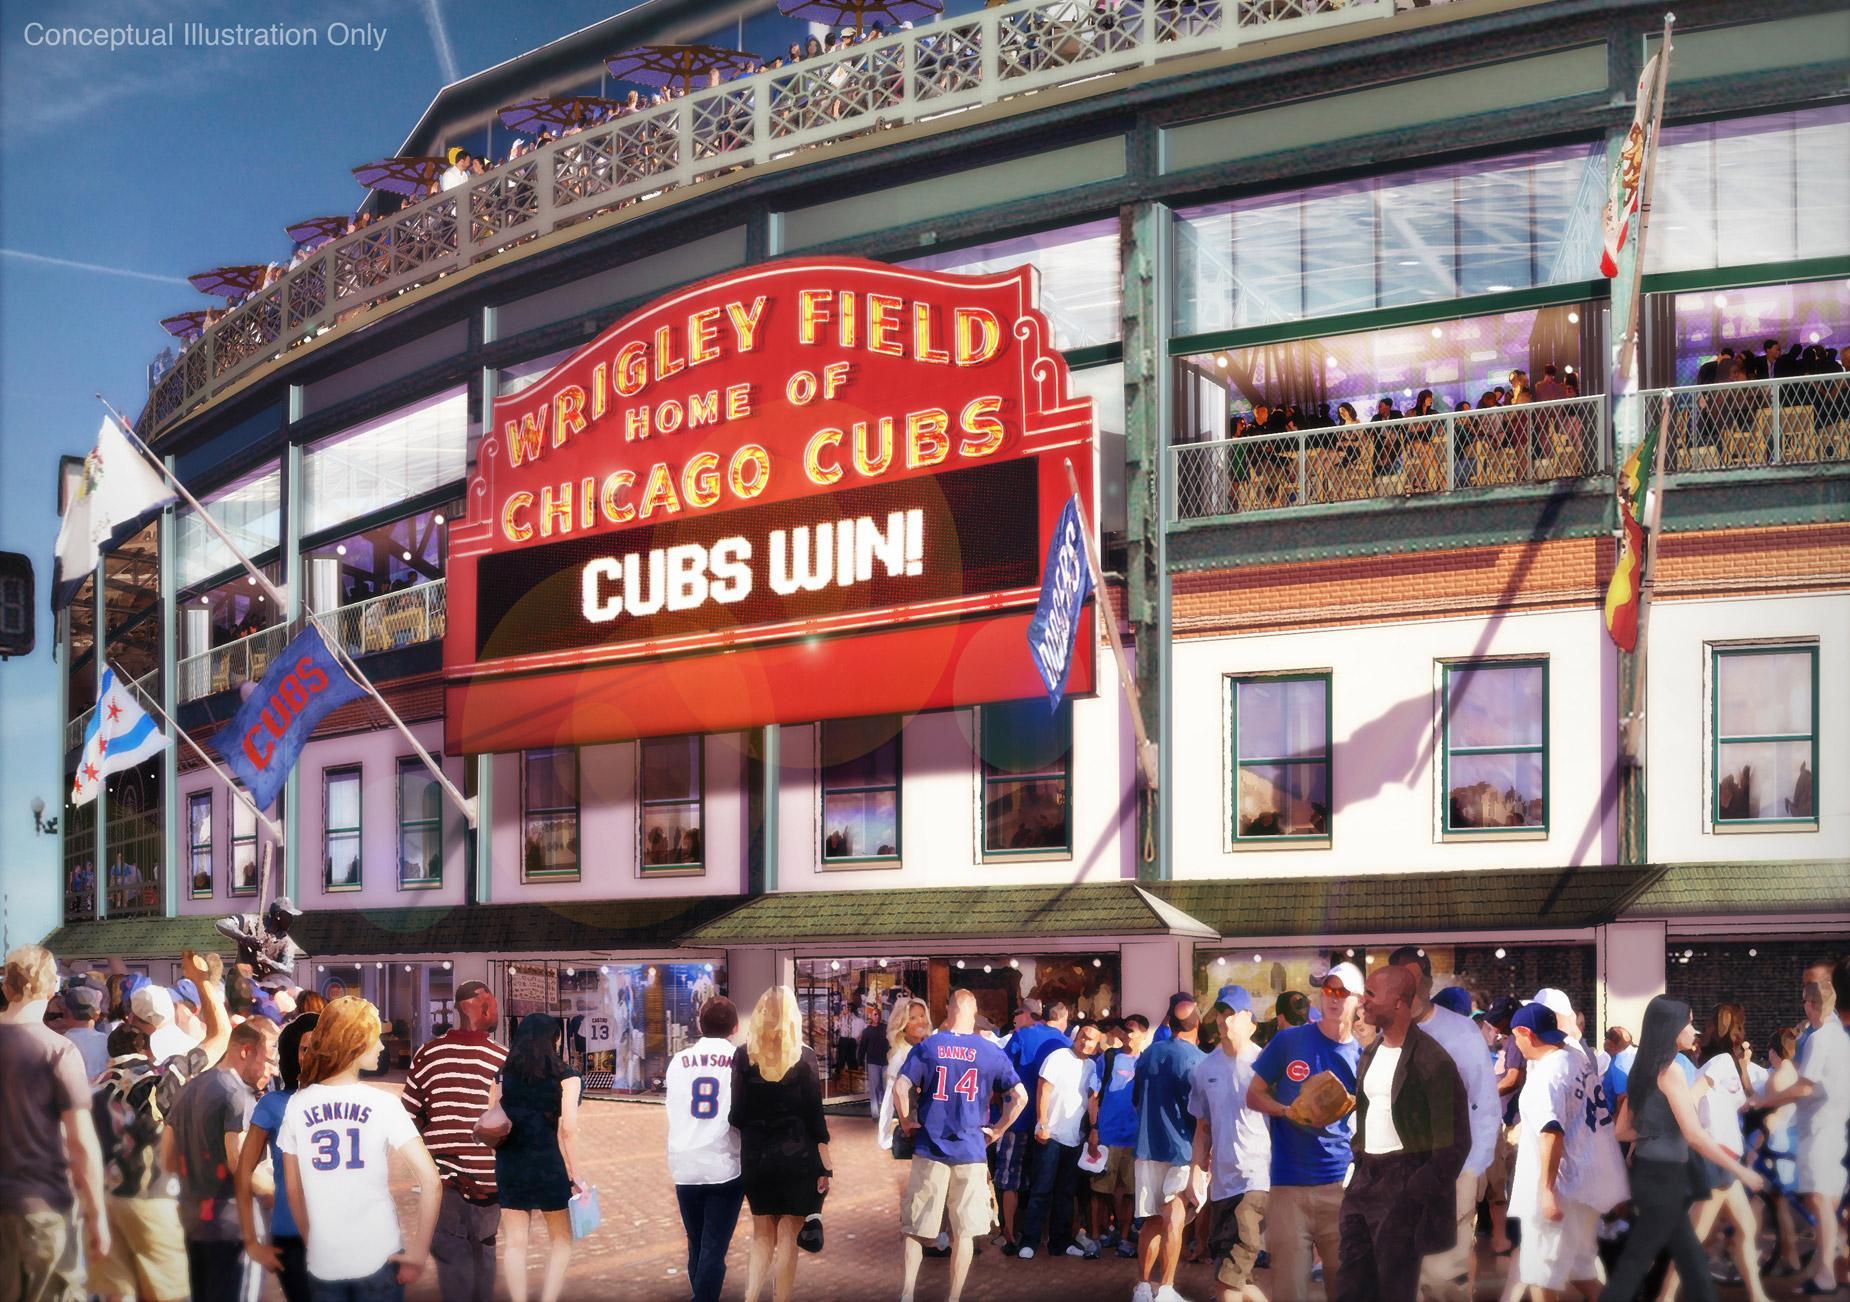 Wrigley Renderings Cubs Locker Room Proposed Wrigley Field - Chicago map showing wrigley field